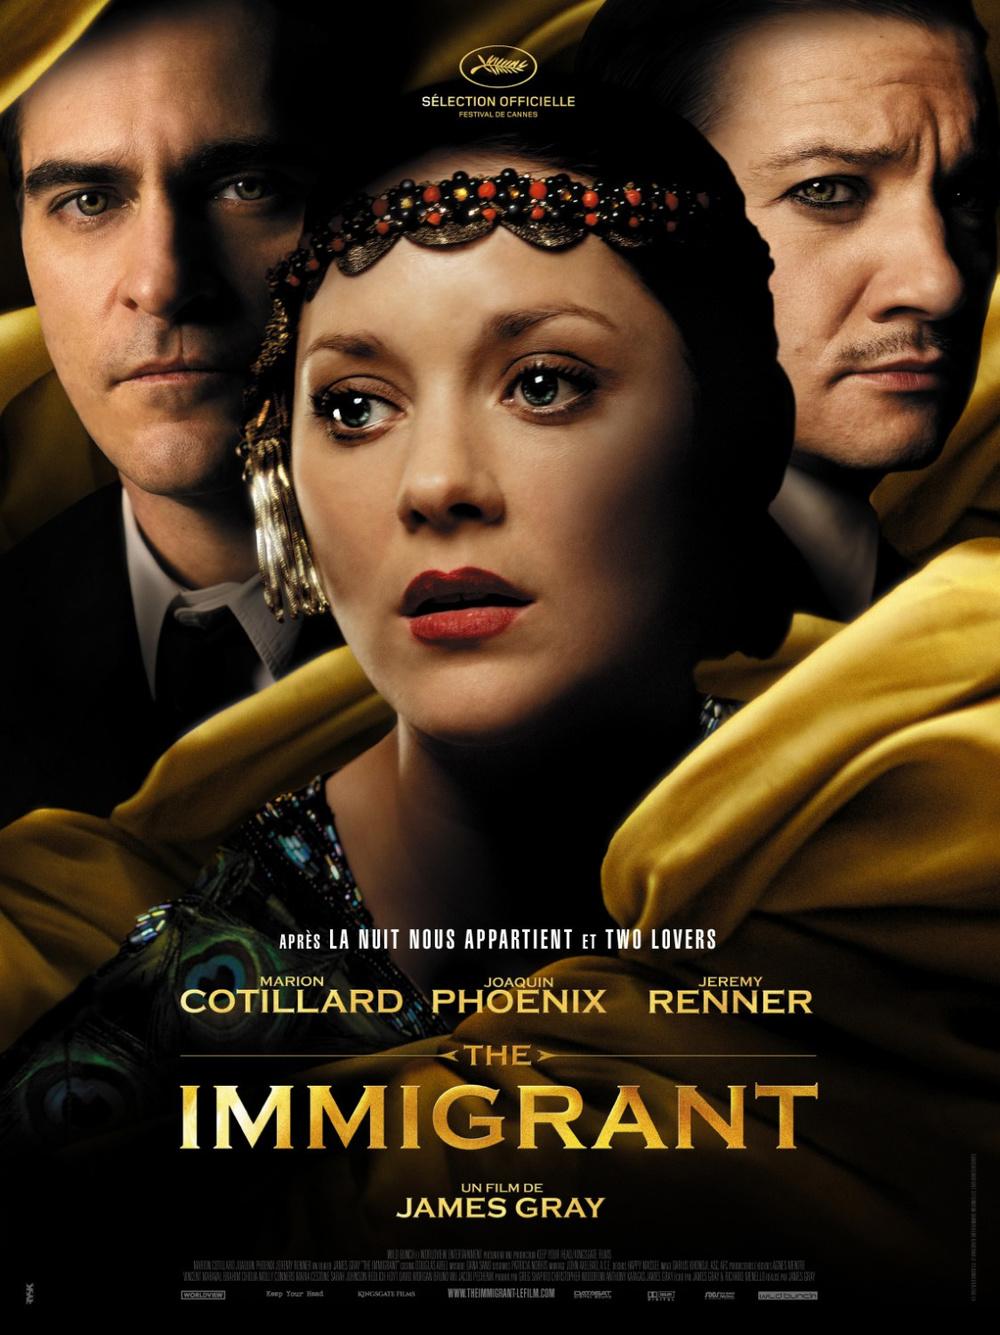 The Immigrant, Joaquin Phoenix, Marion Cotillard, Jeremy Renner